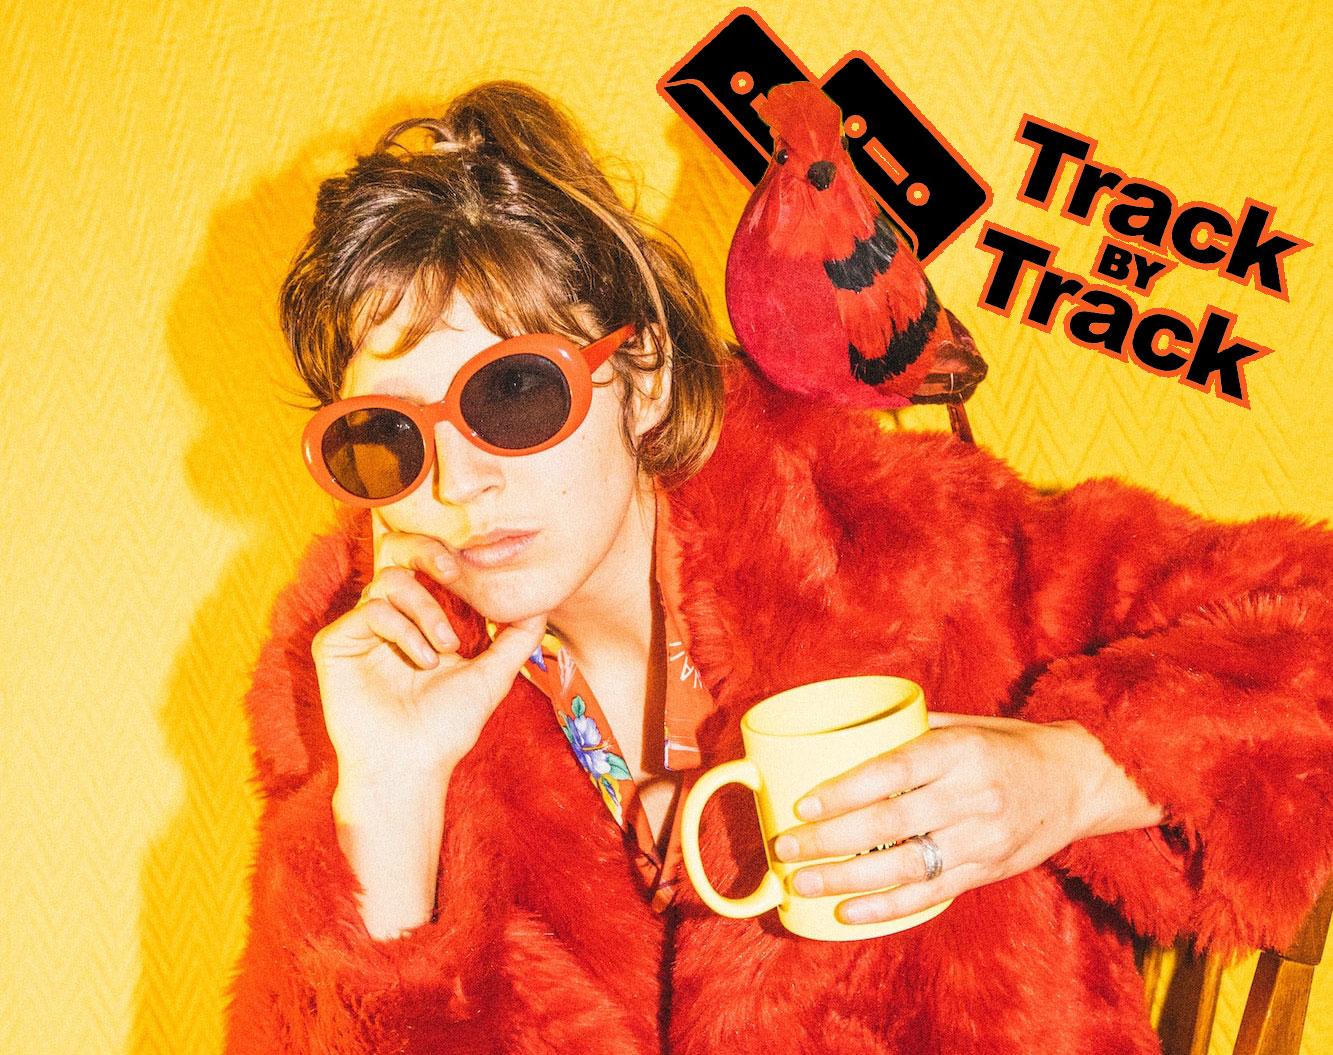 Caroline Rose Track by Track, photo by CJ Harvey